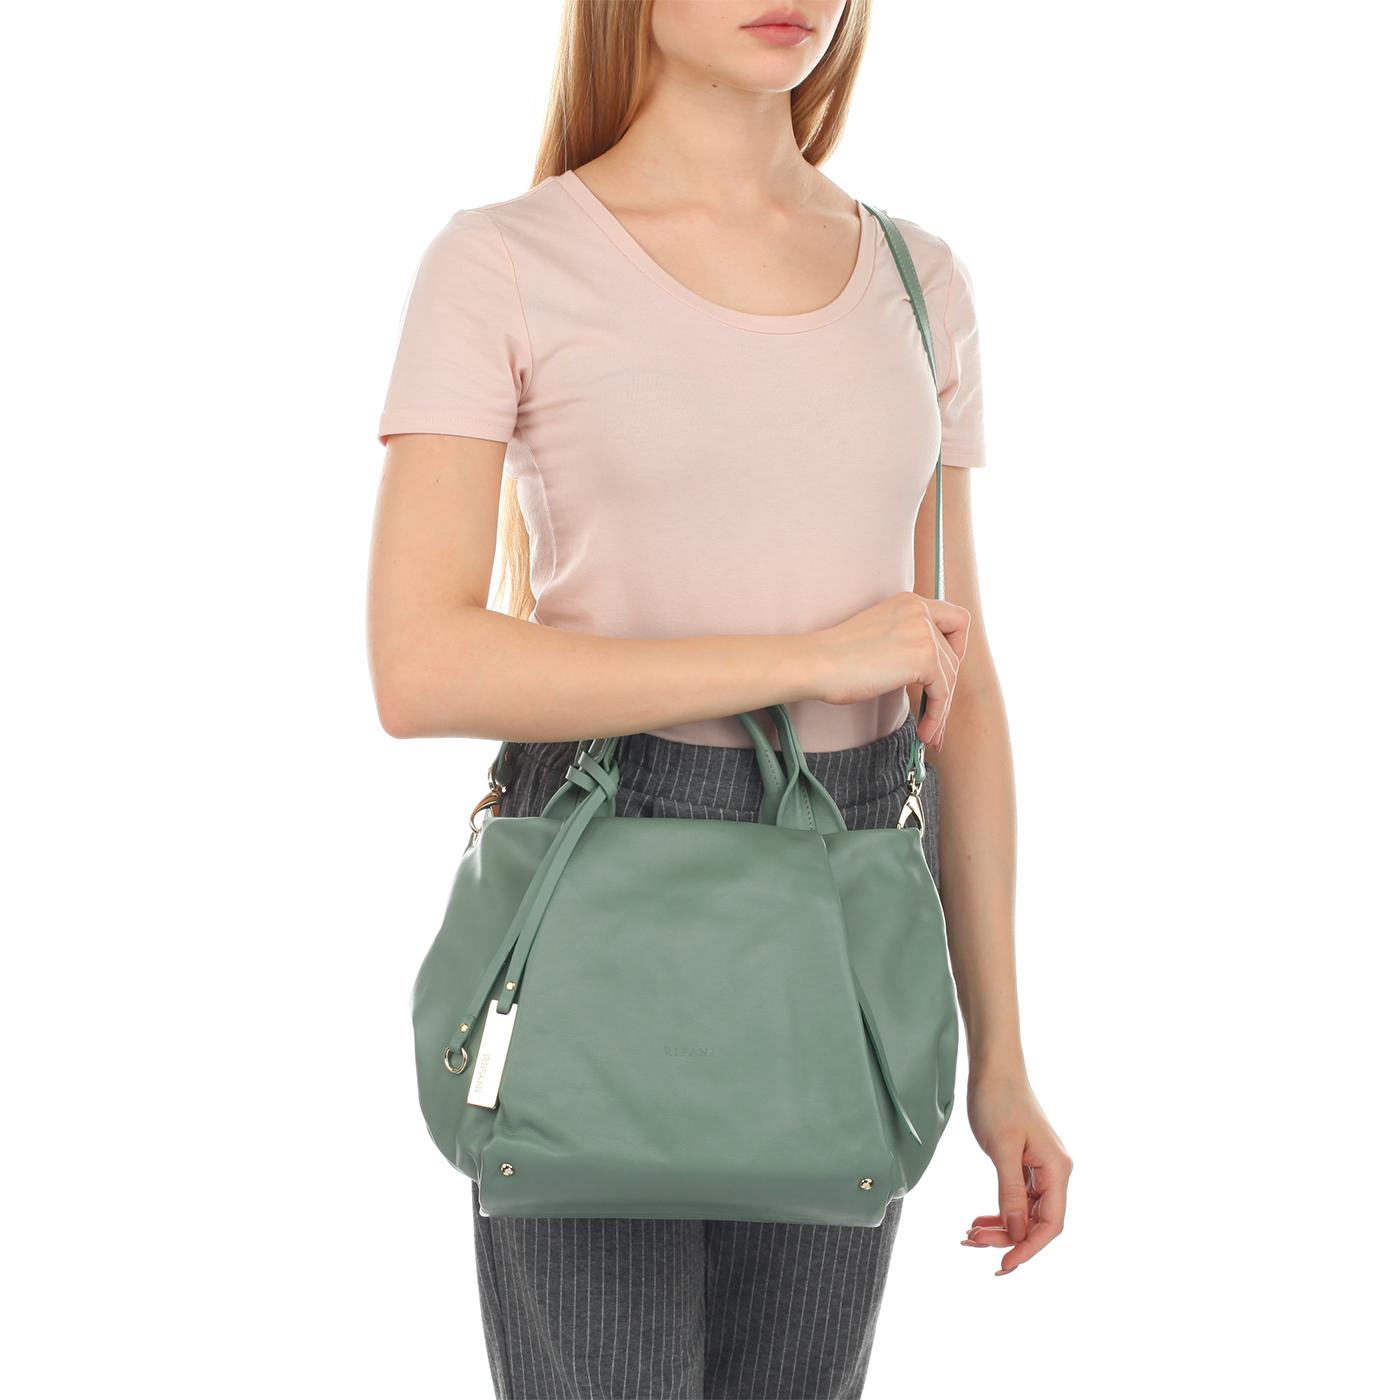 d1ebab39490b Женская сумка из мягкой кожи Ripani Lime 7835LL.00051 ...